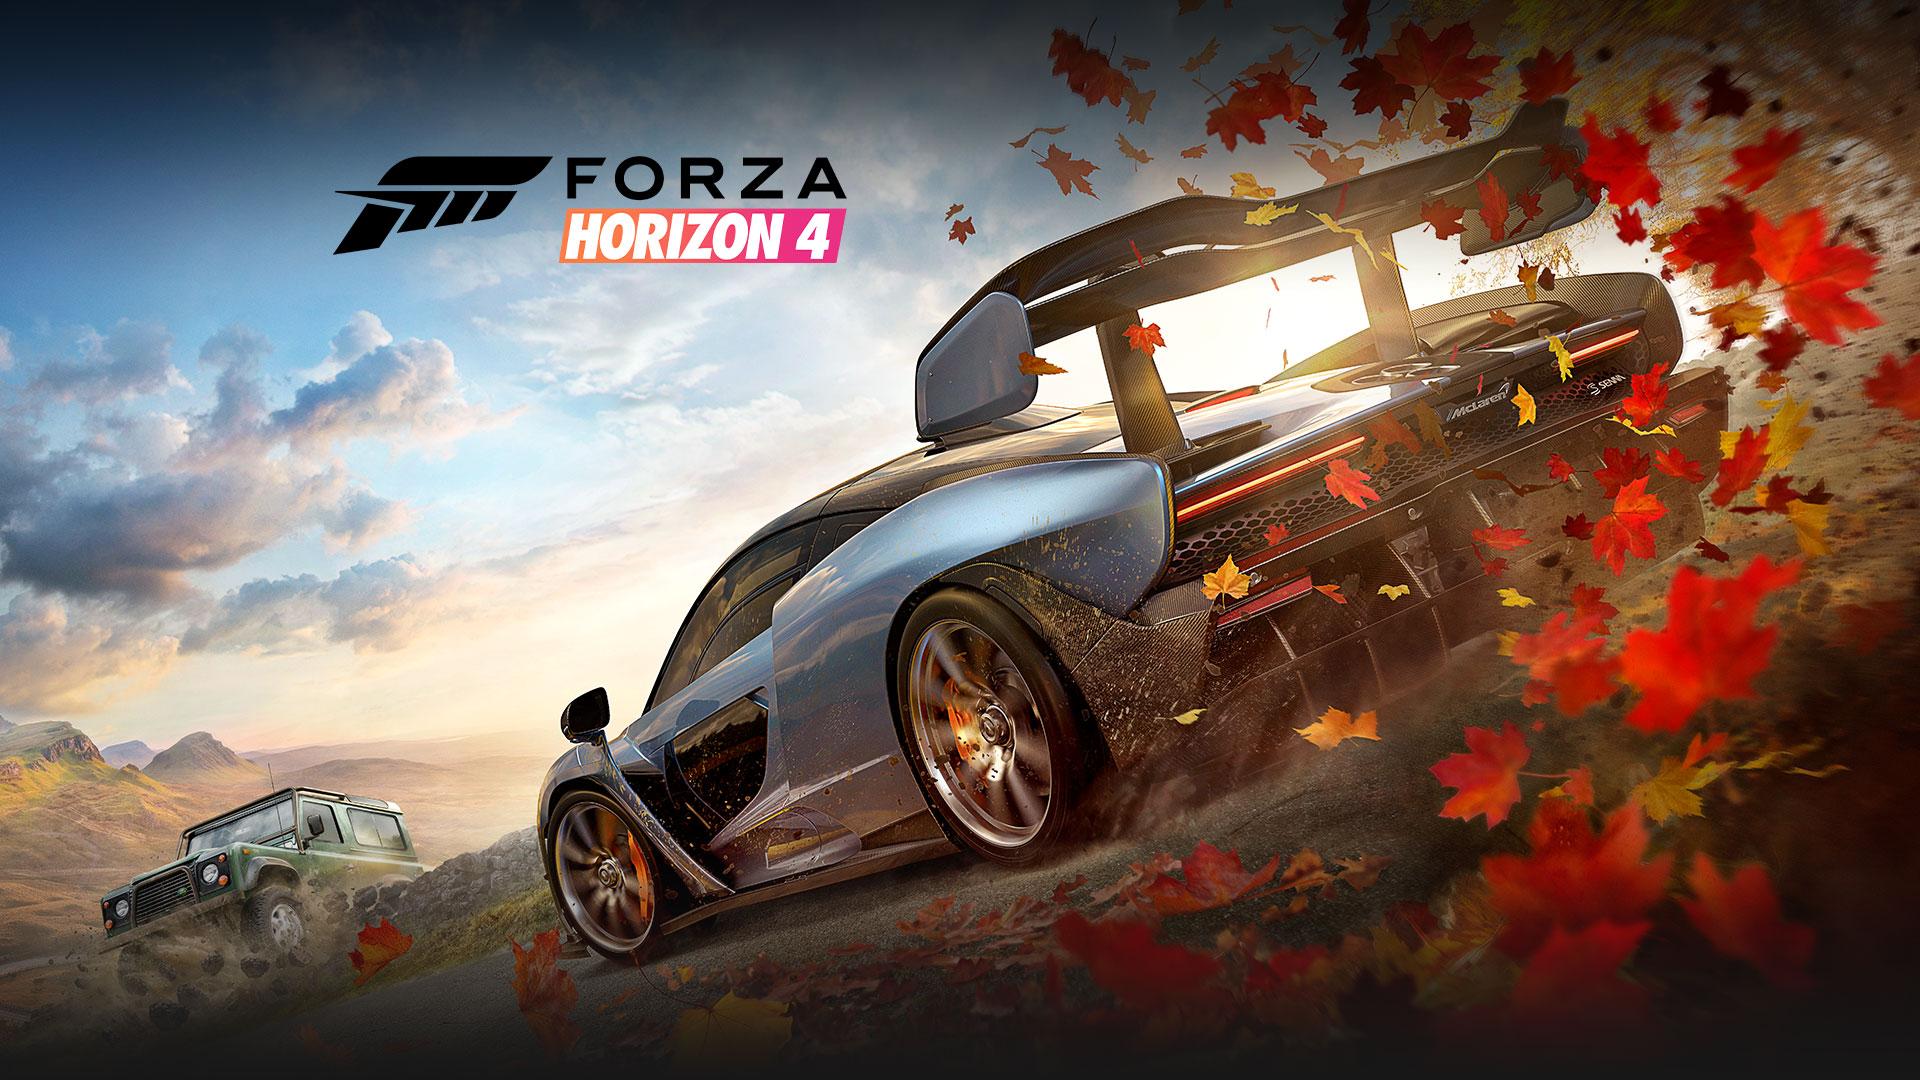 Forza Horizon 4, δύο αυτοκίνητα, το ένα από αυτά με φύλλα πίσω του